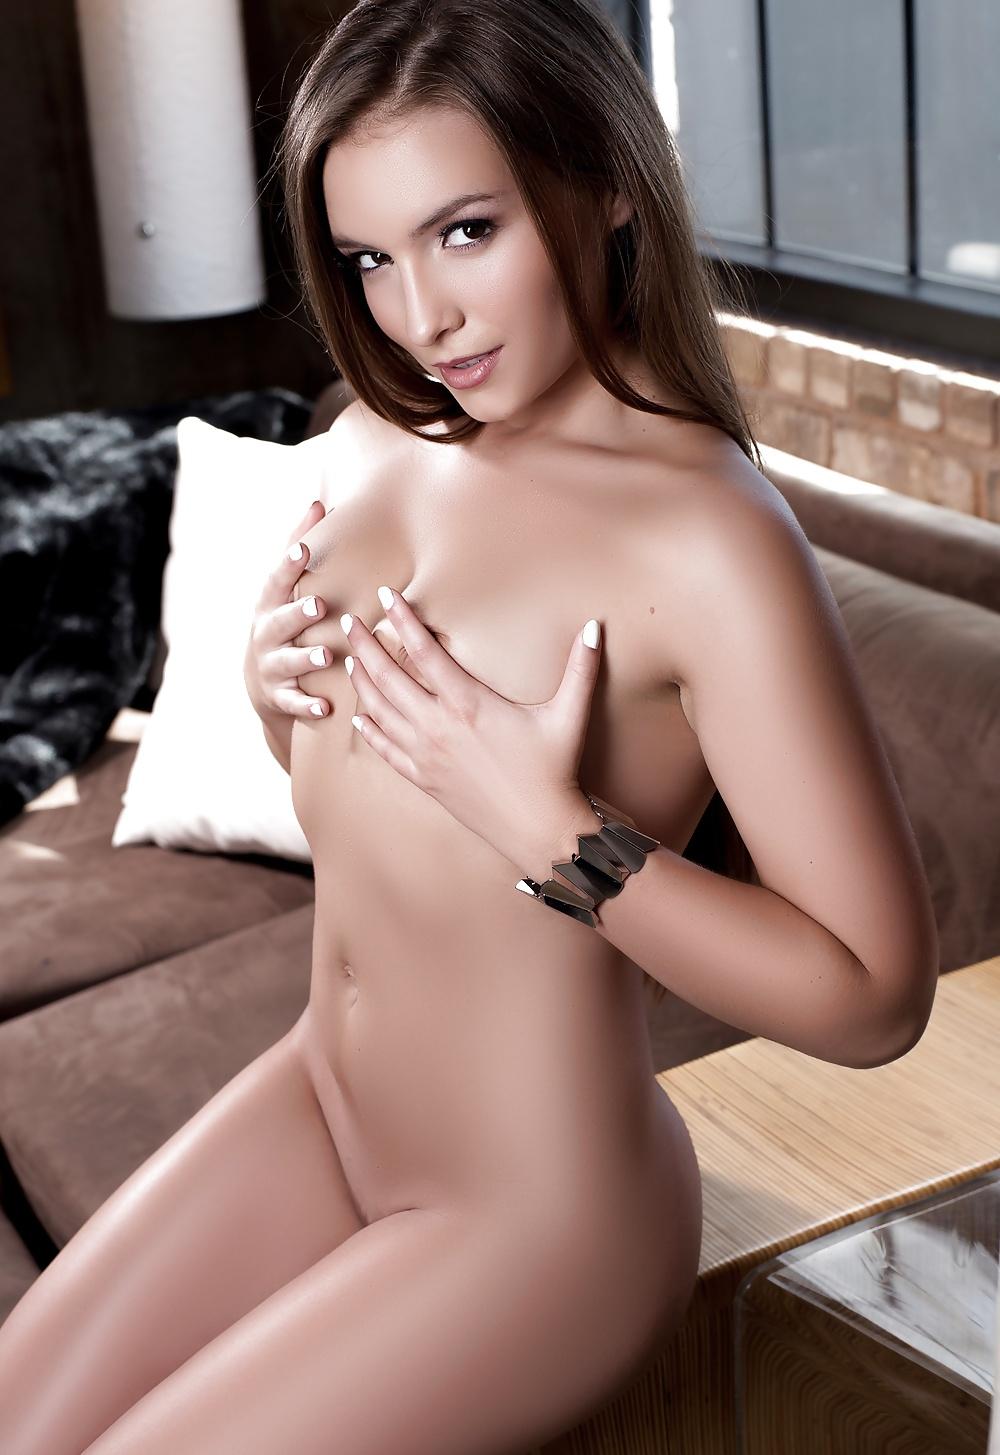 Mandy moore nude photos of celebrities